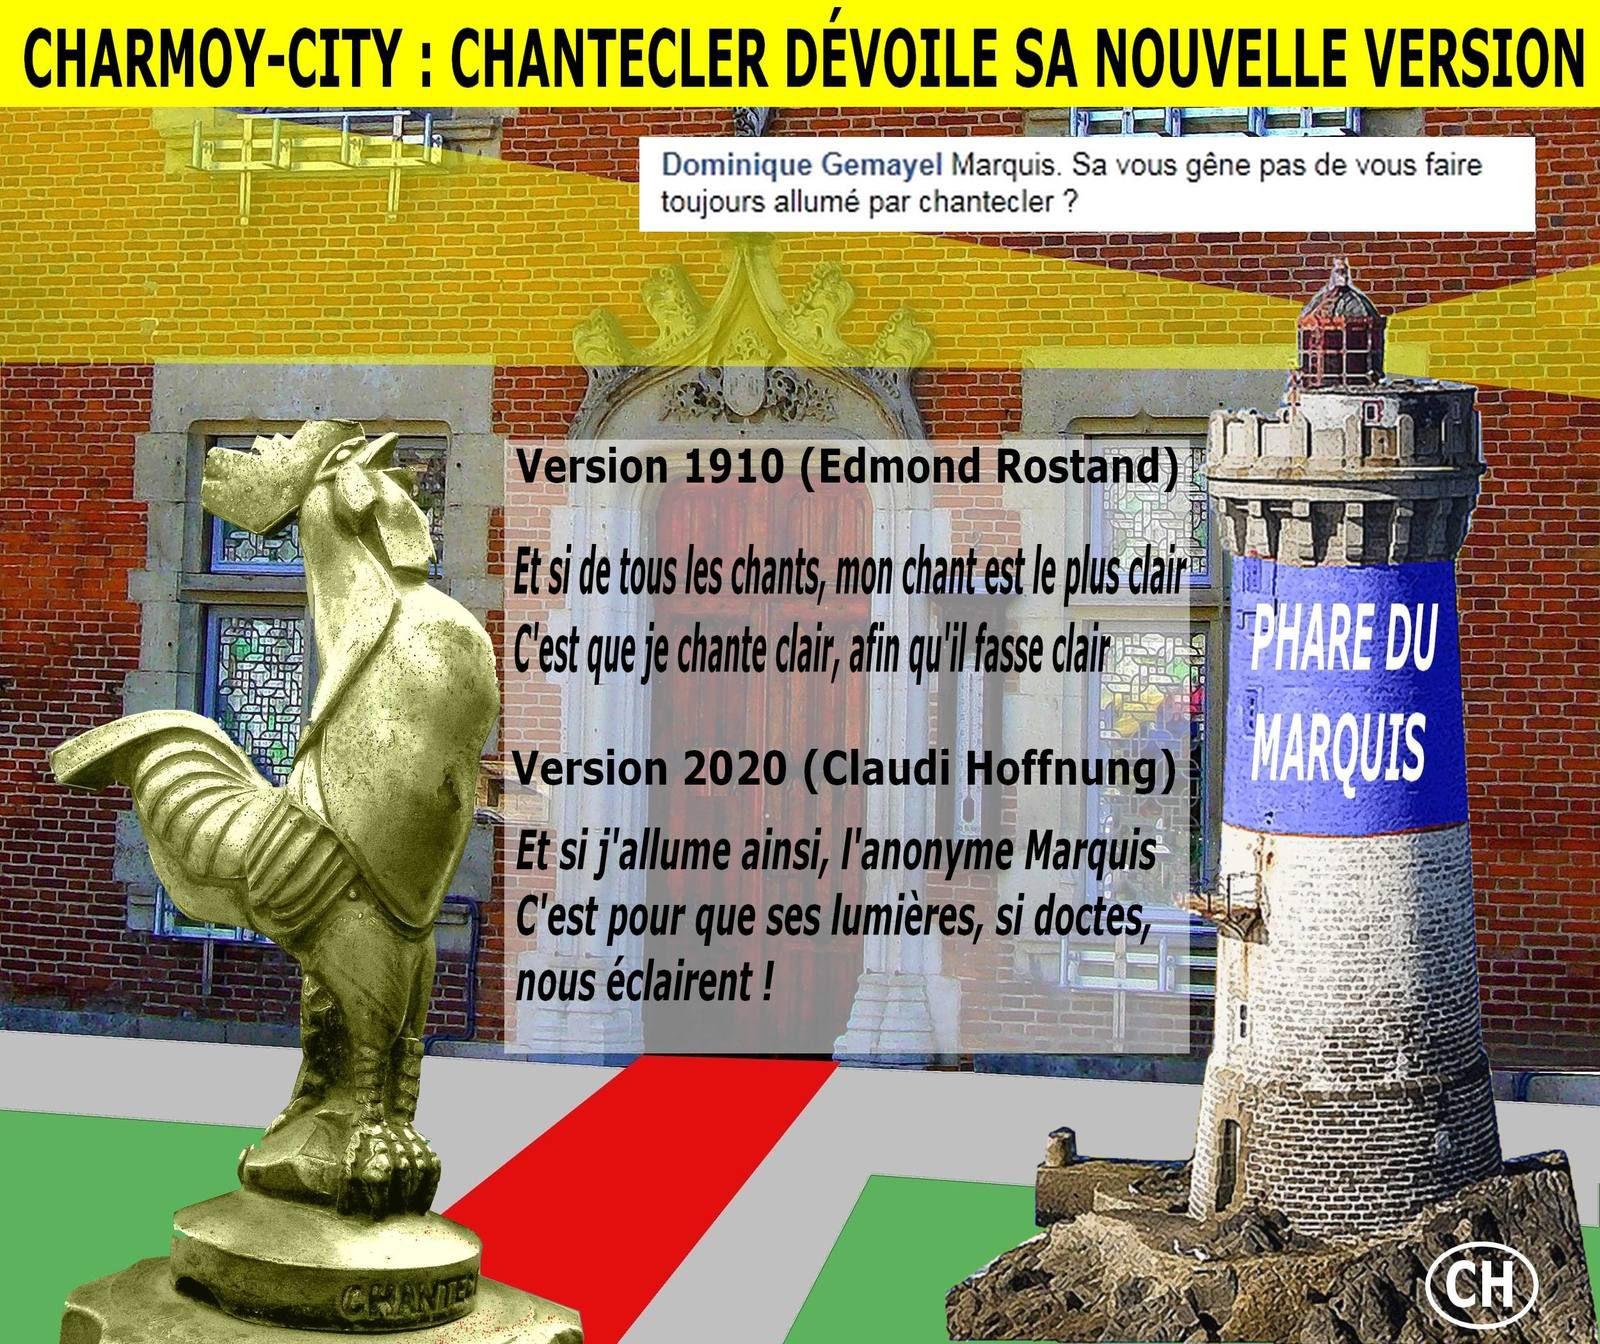 Charmoy-city, Chantecler dévoile sa version 2020.jpg